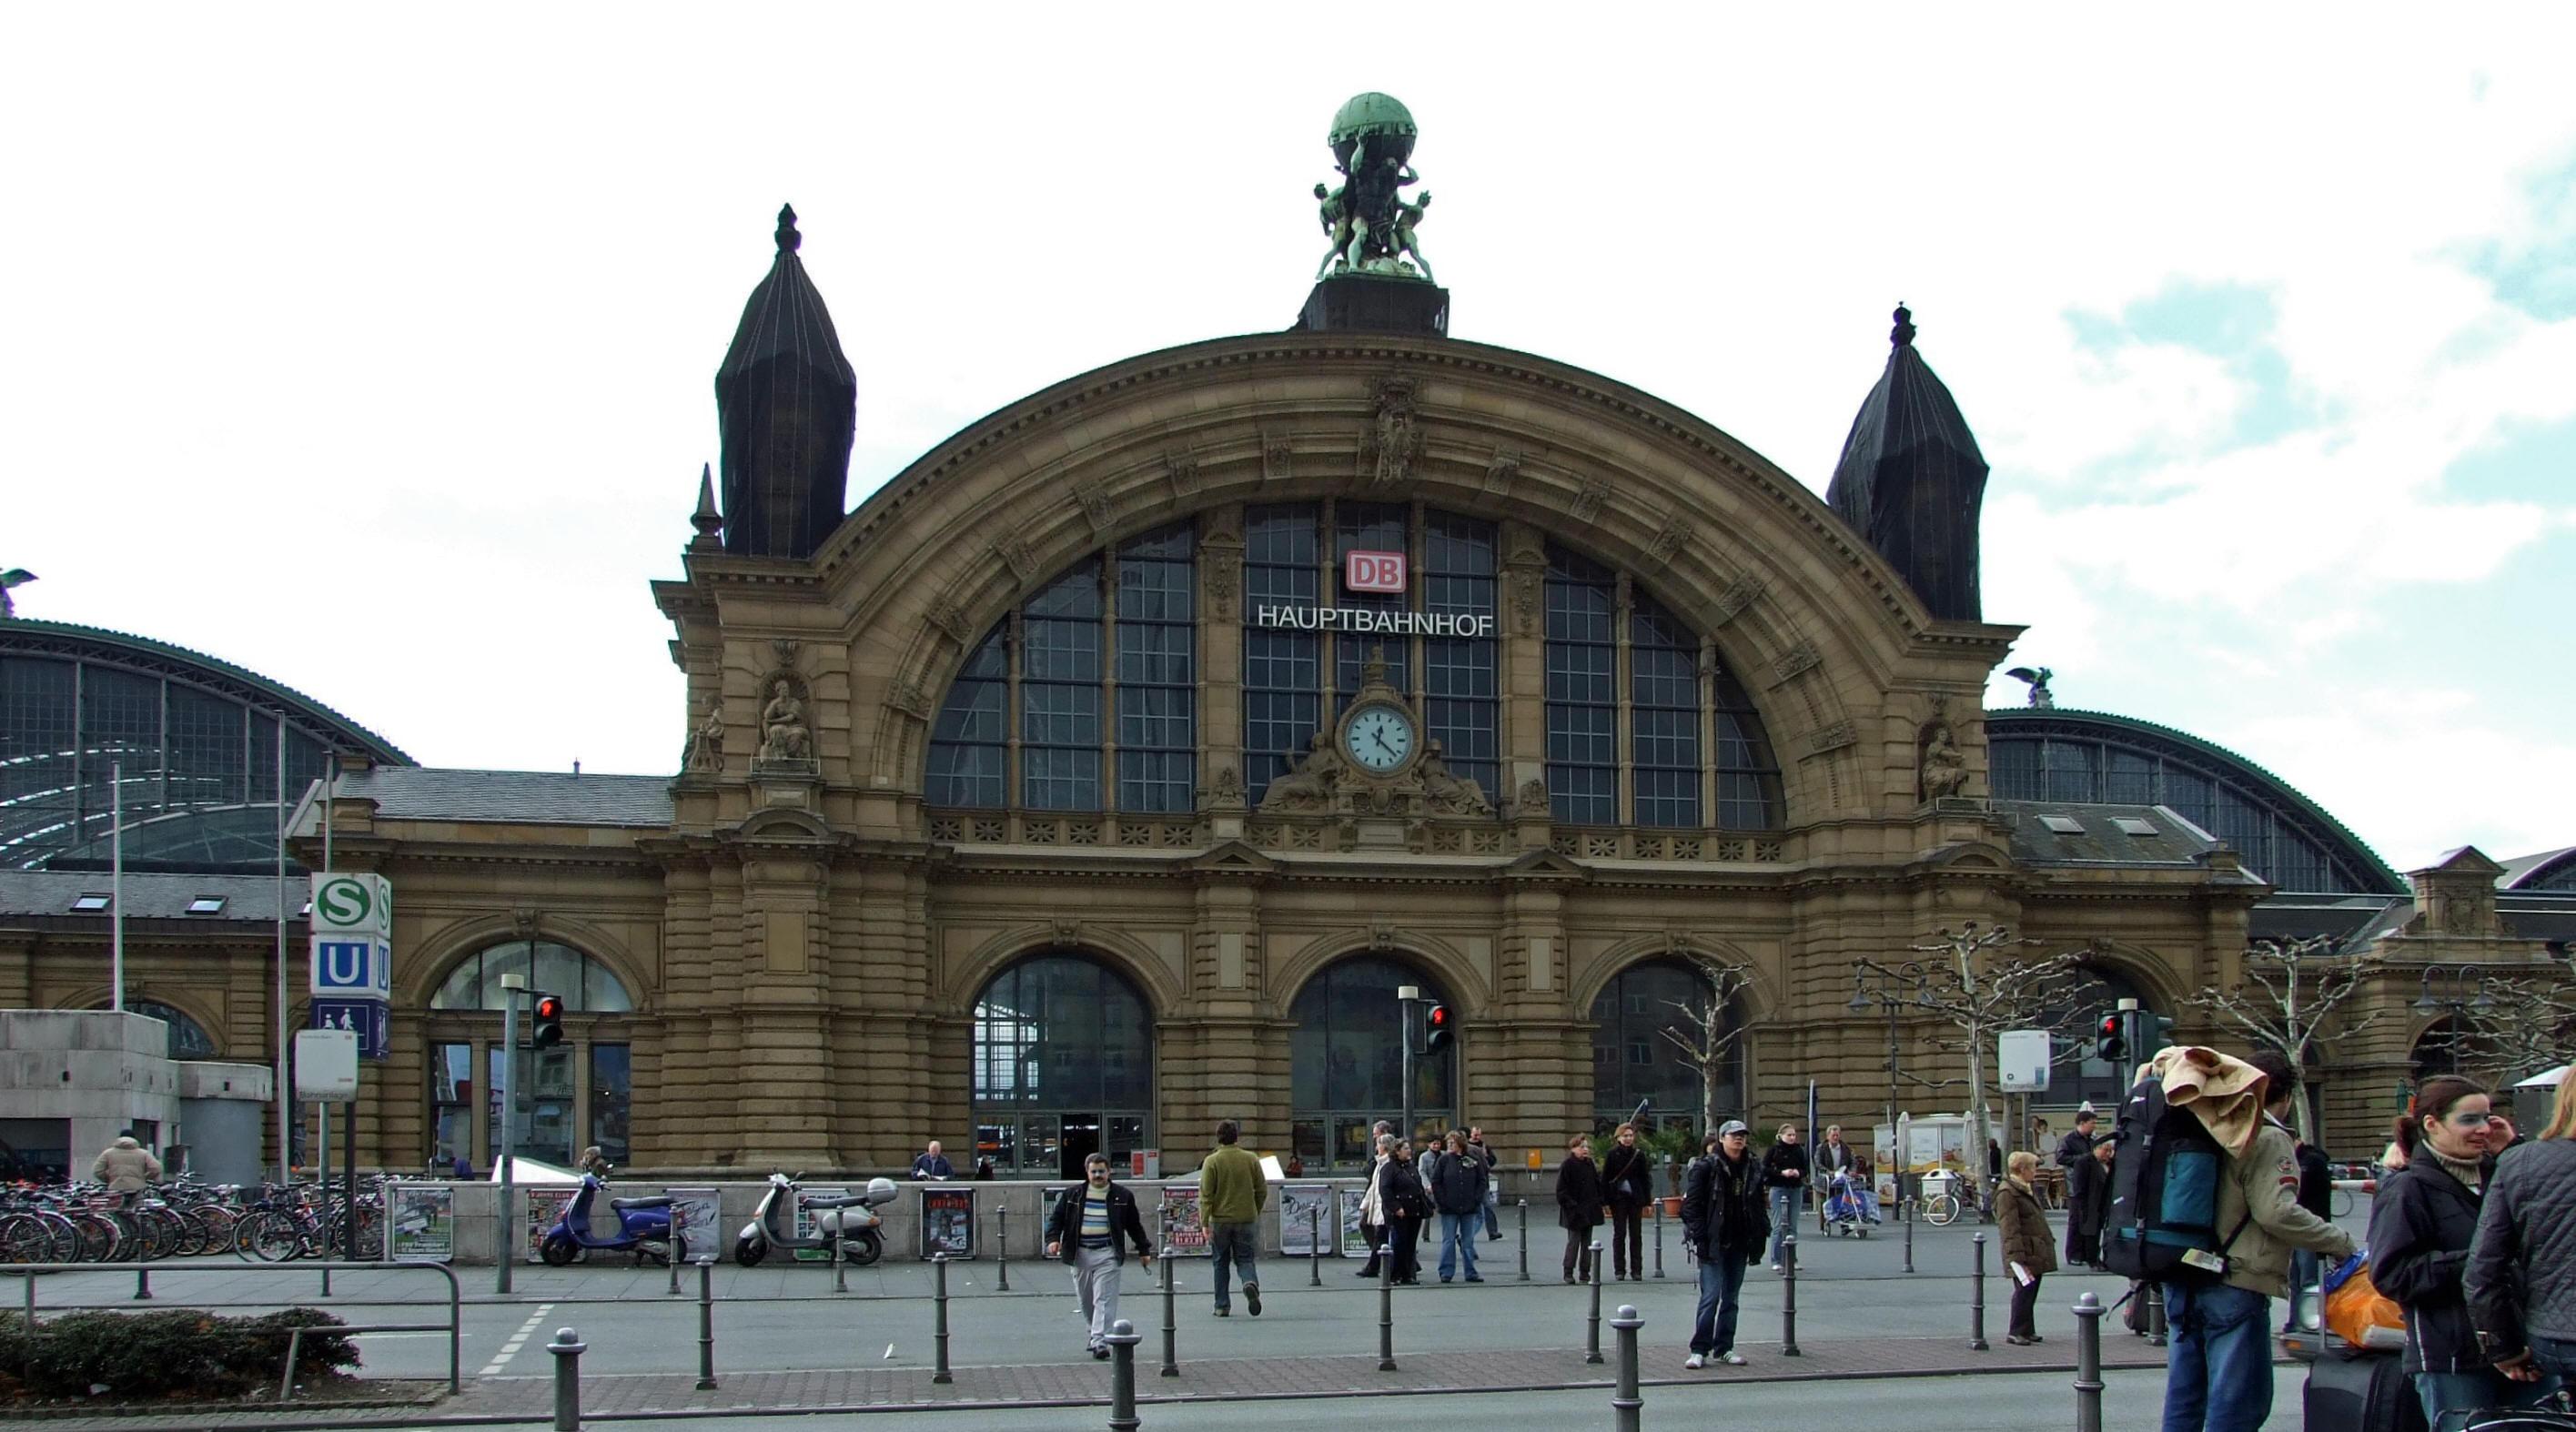 Frankfurt Architecture, Germany, Hauptbahnhof Train station